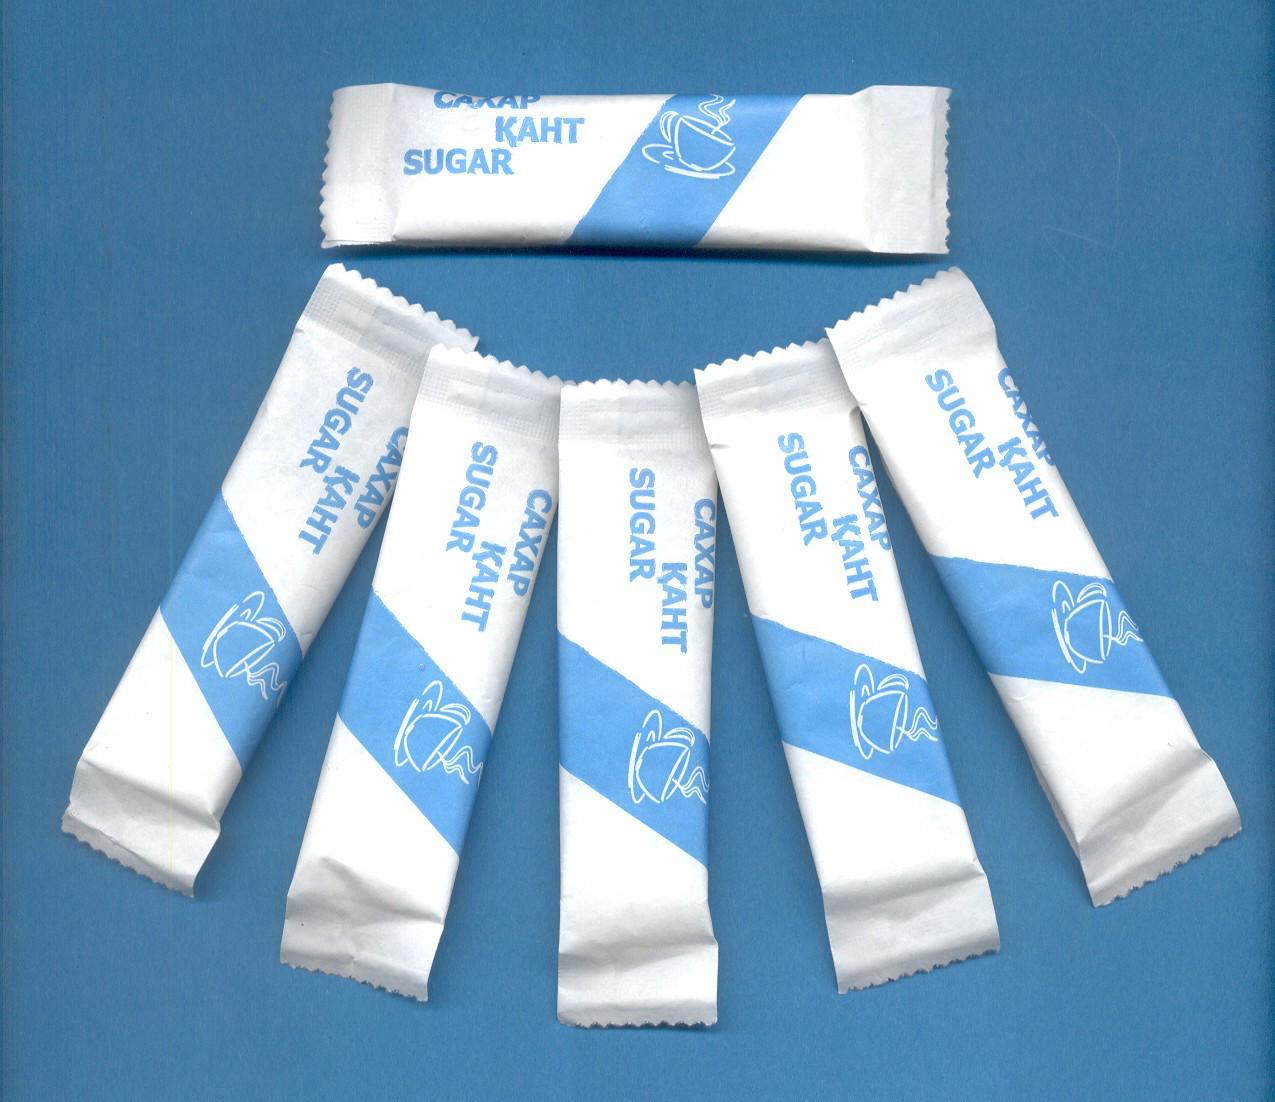 Сахар (с логотипом) 10гр., пакетированный (Sherdin)